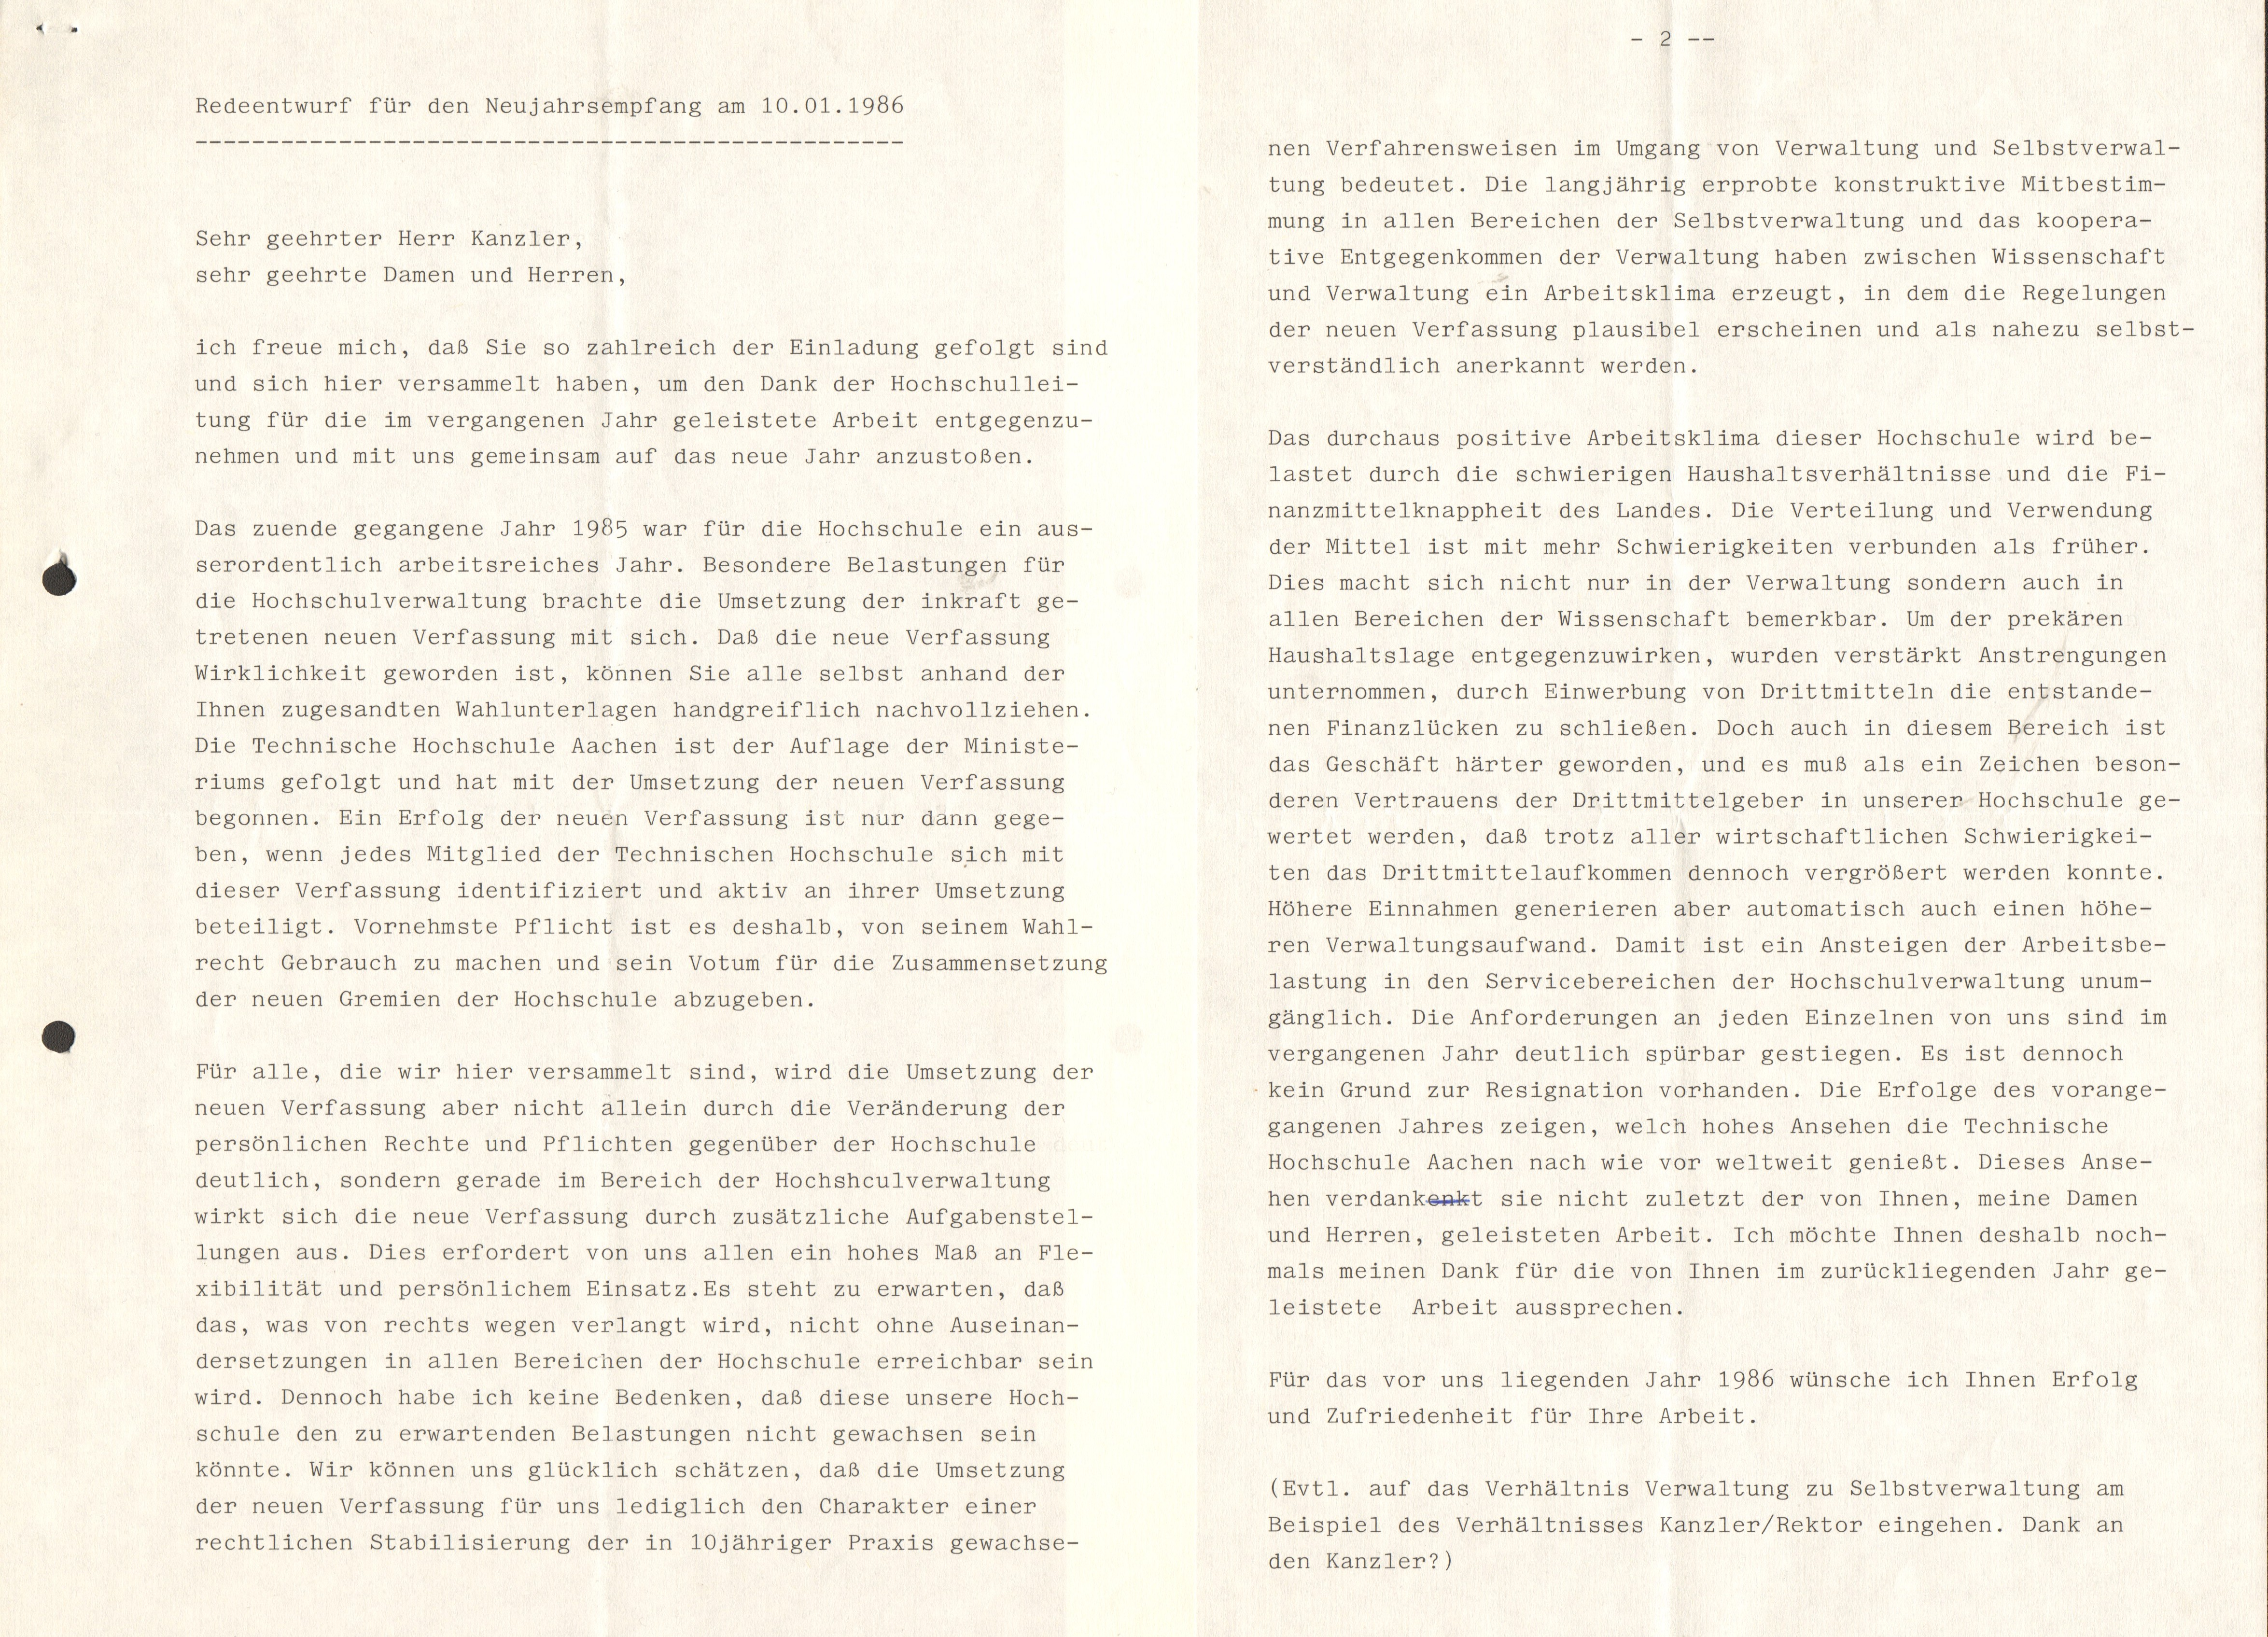 12144_NeujahrsredeRektor1986